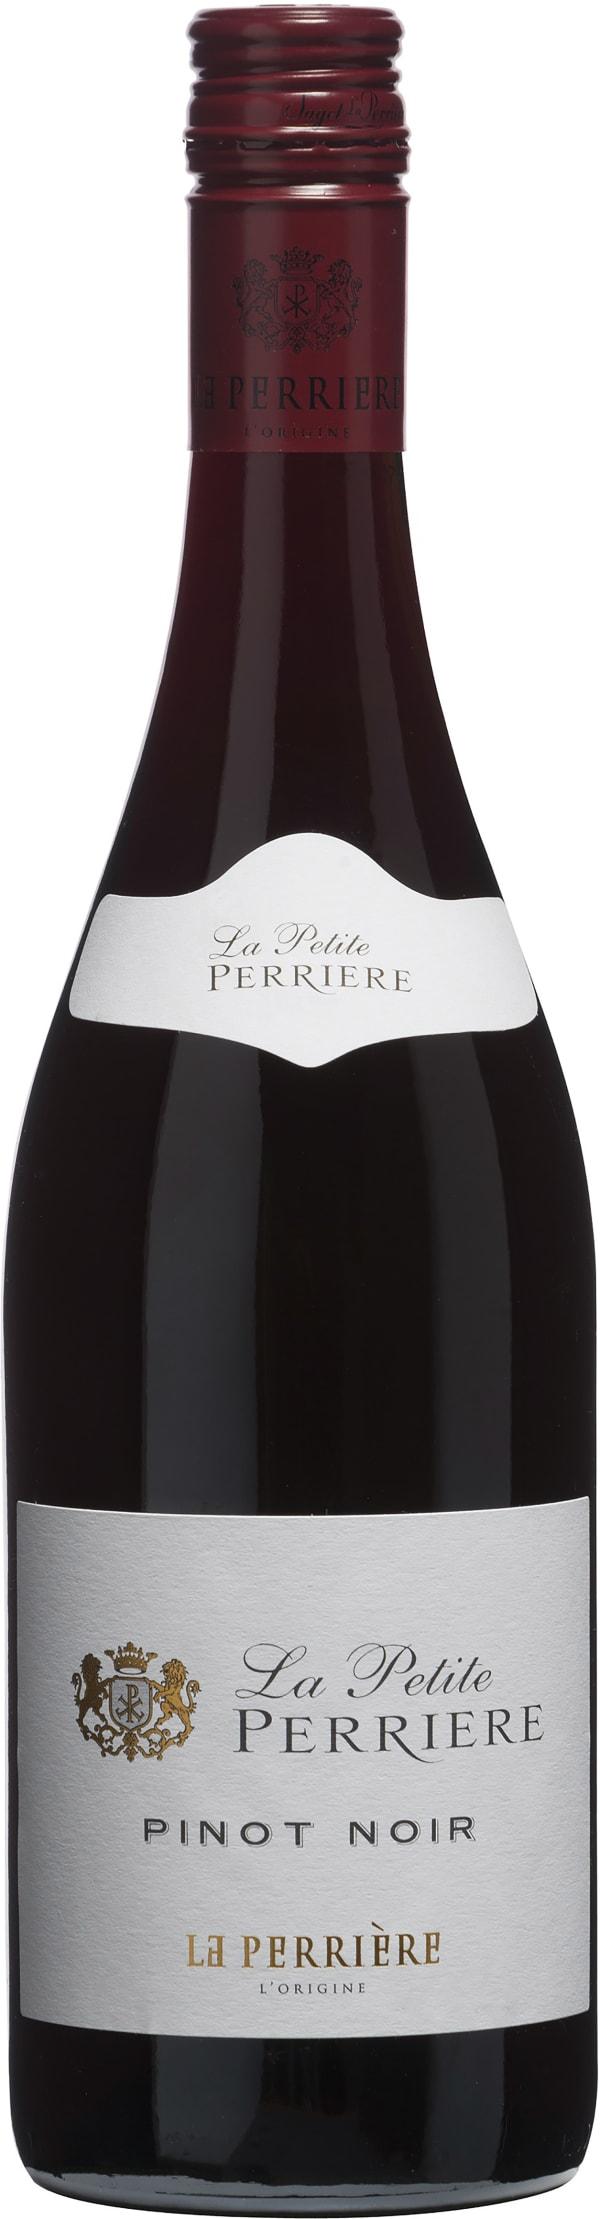 La Petite Perriere Pinot Noir 2018